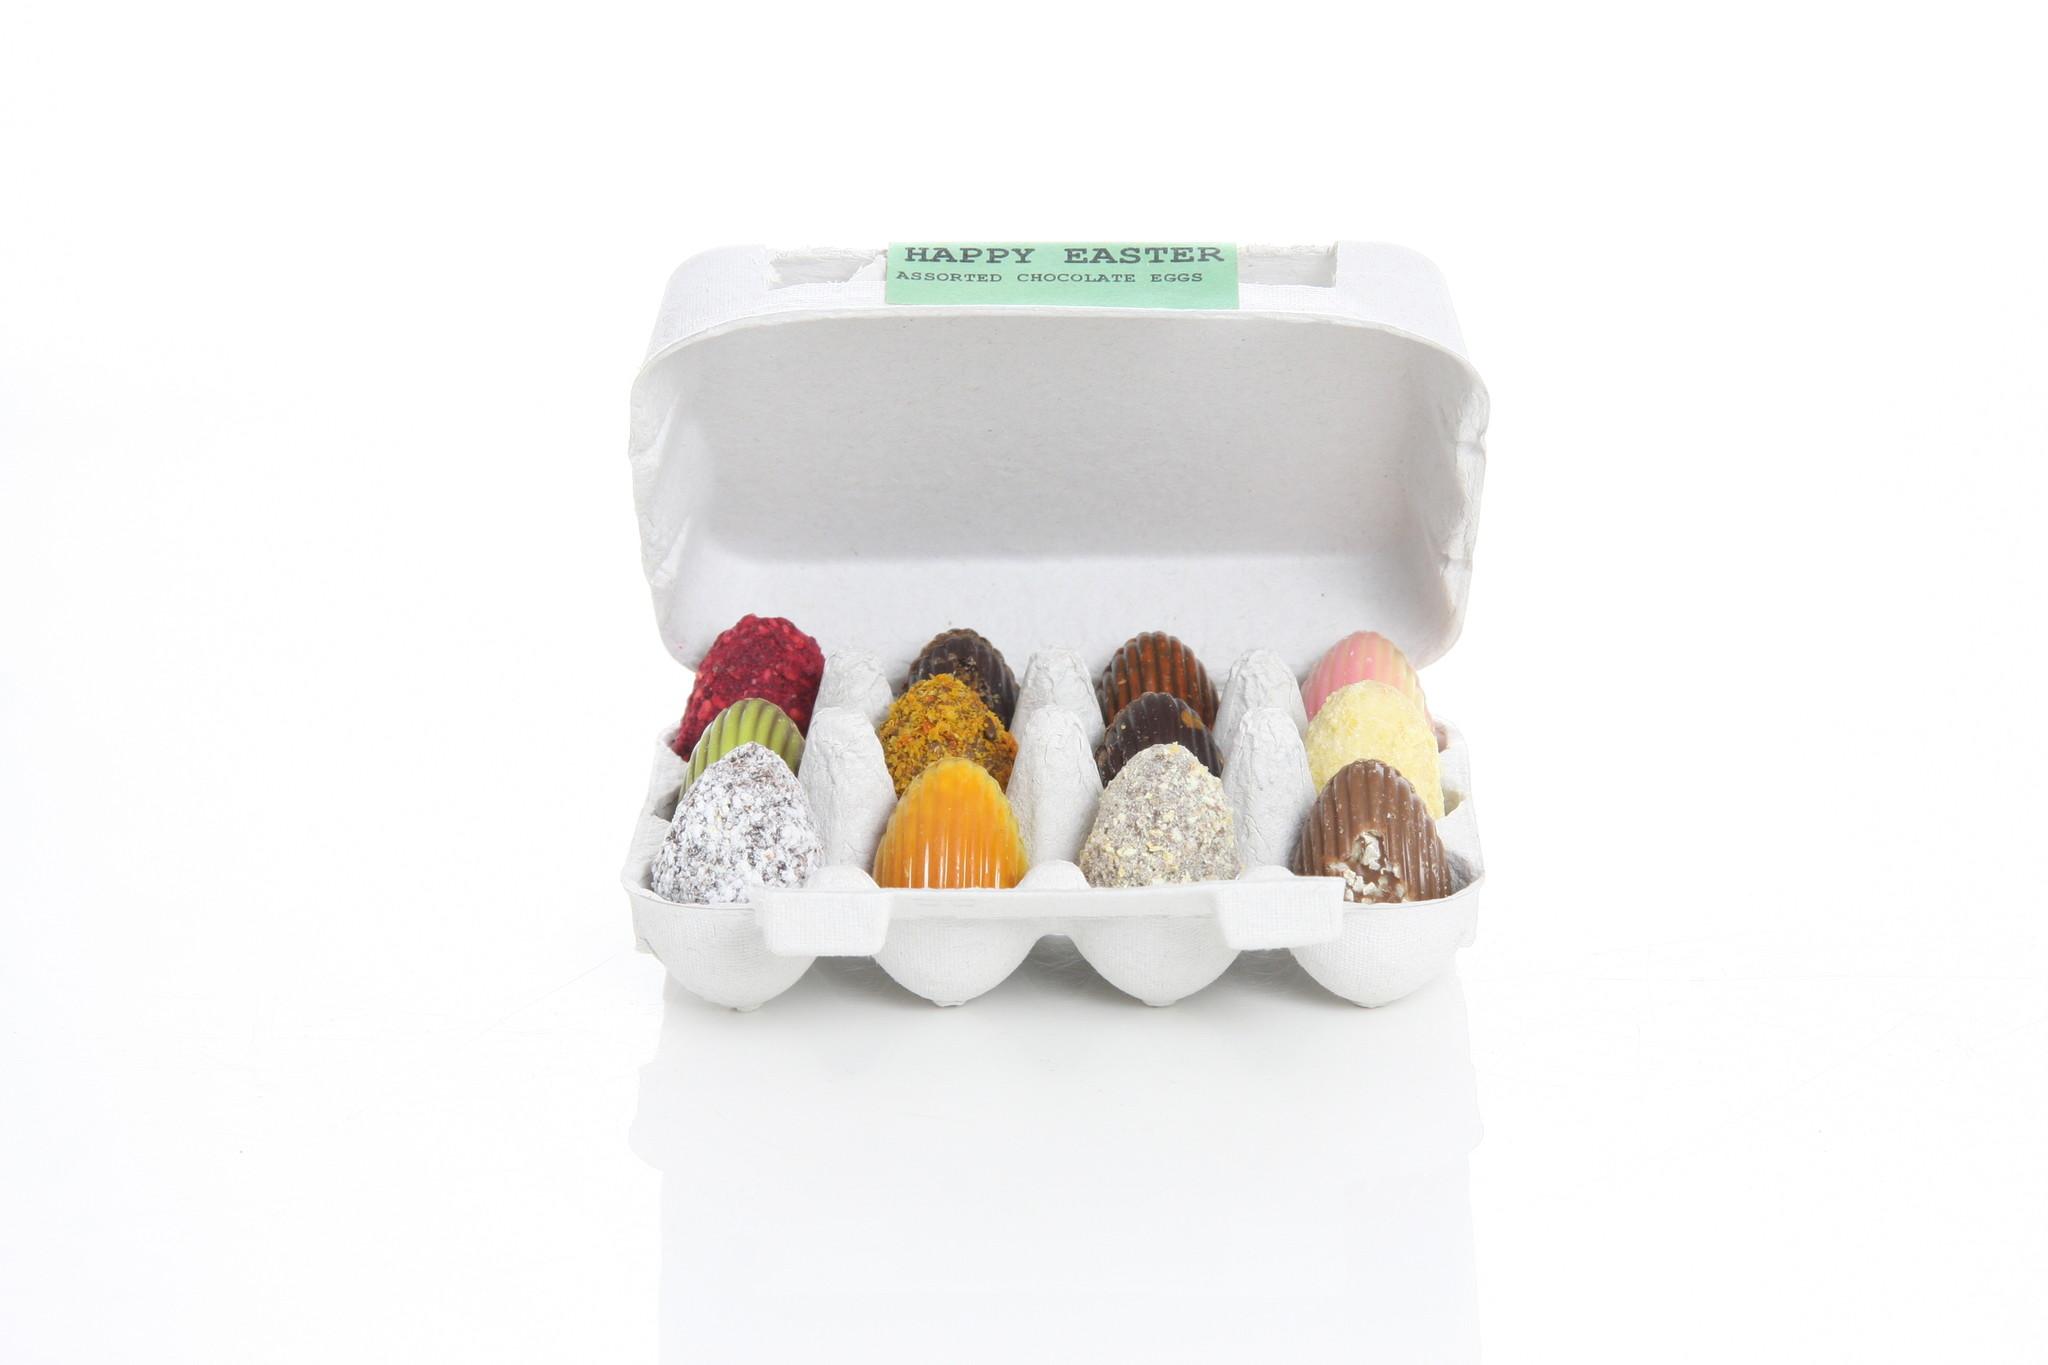 12 assorted chocolate Easter eggs in cardboard egg carton